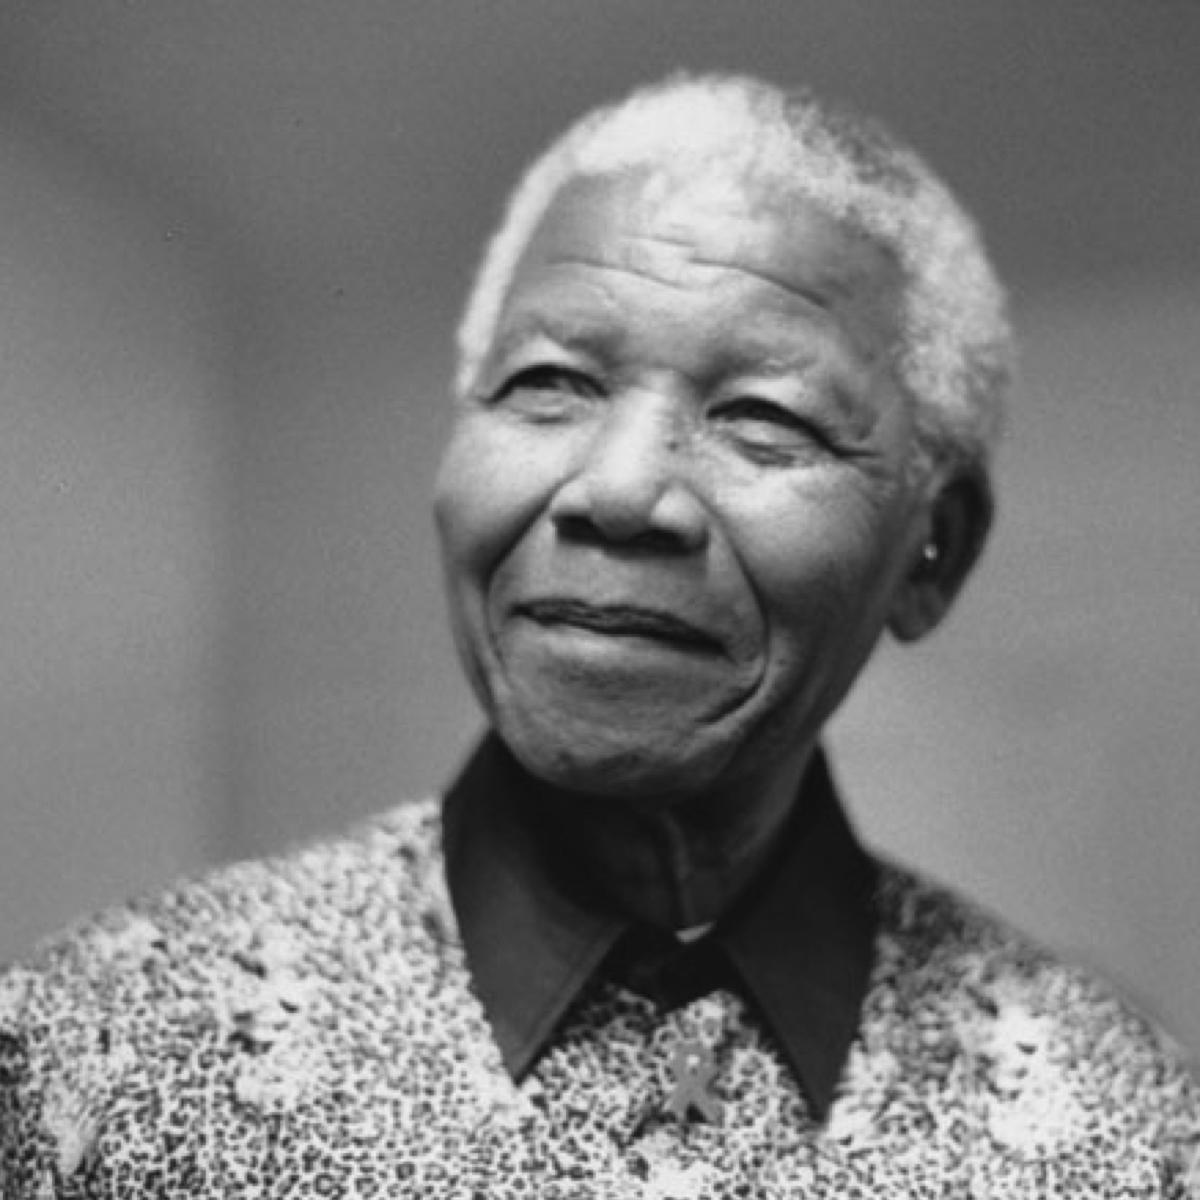 Portrait photo of Nelson Mandela